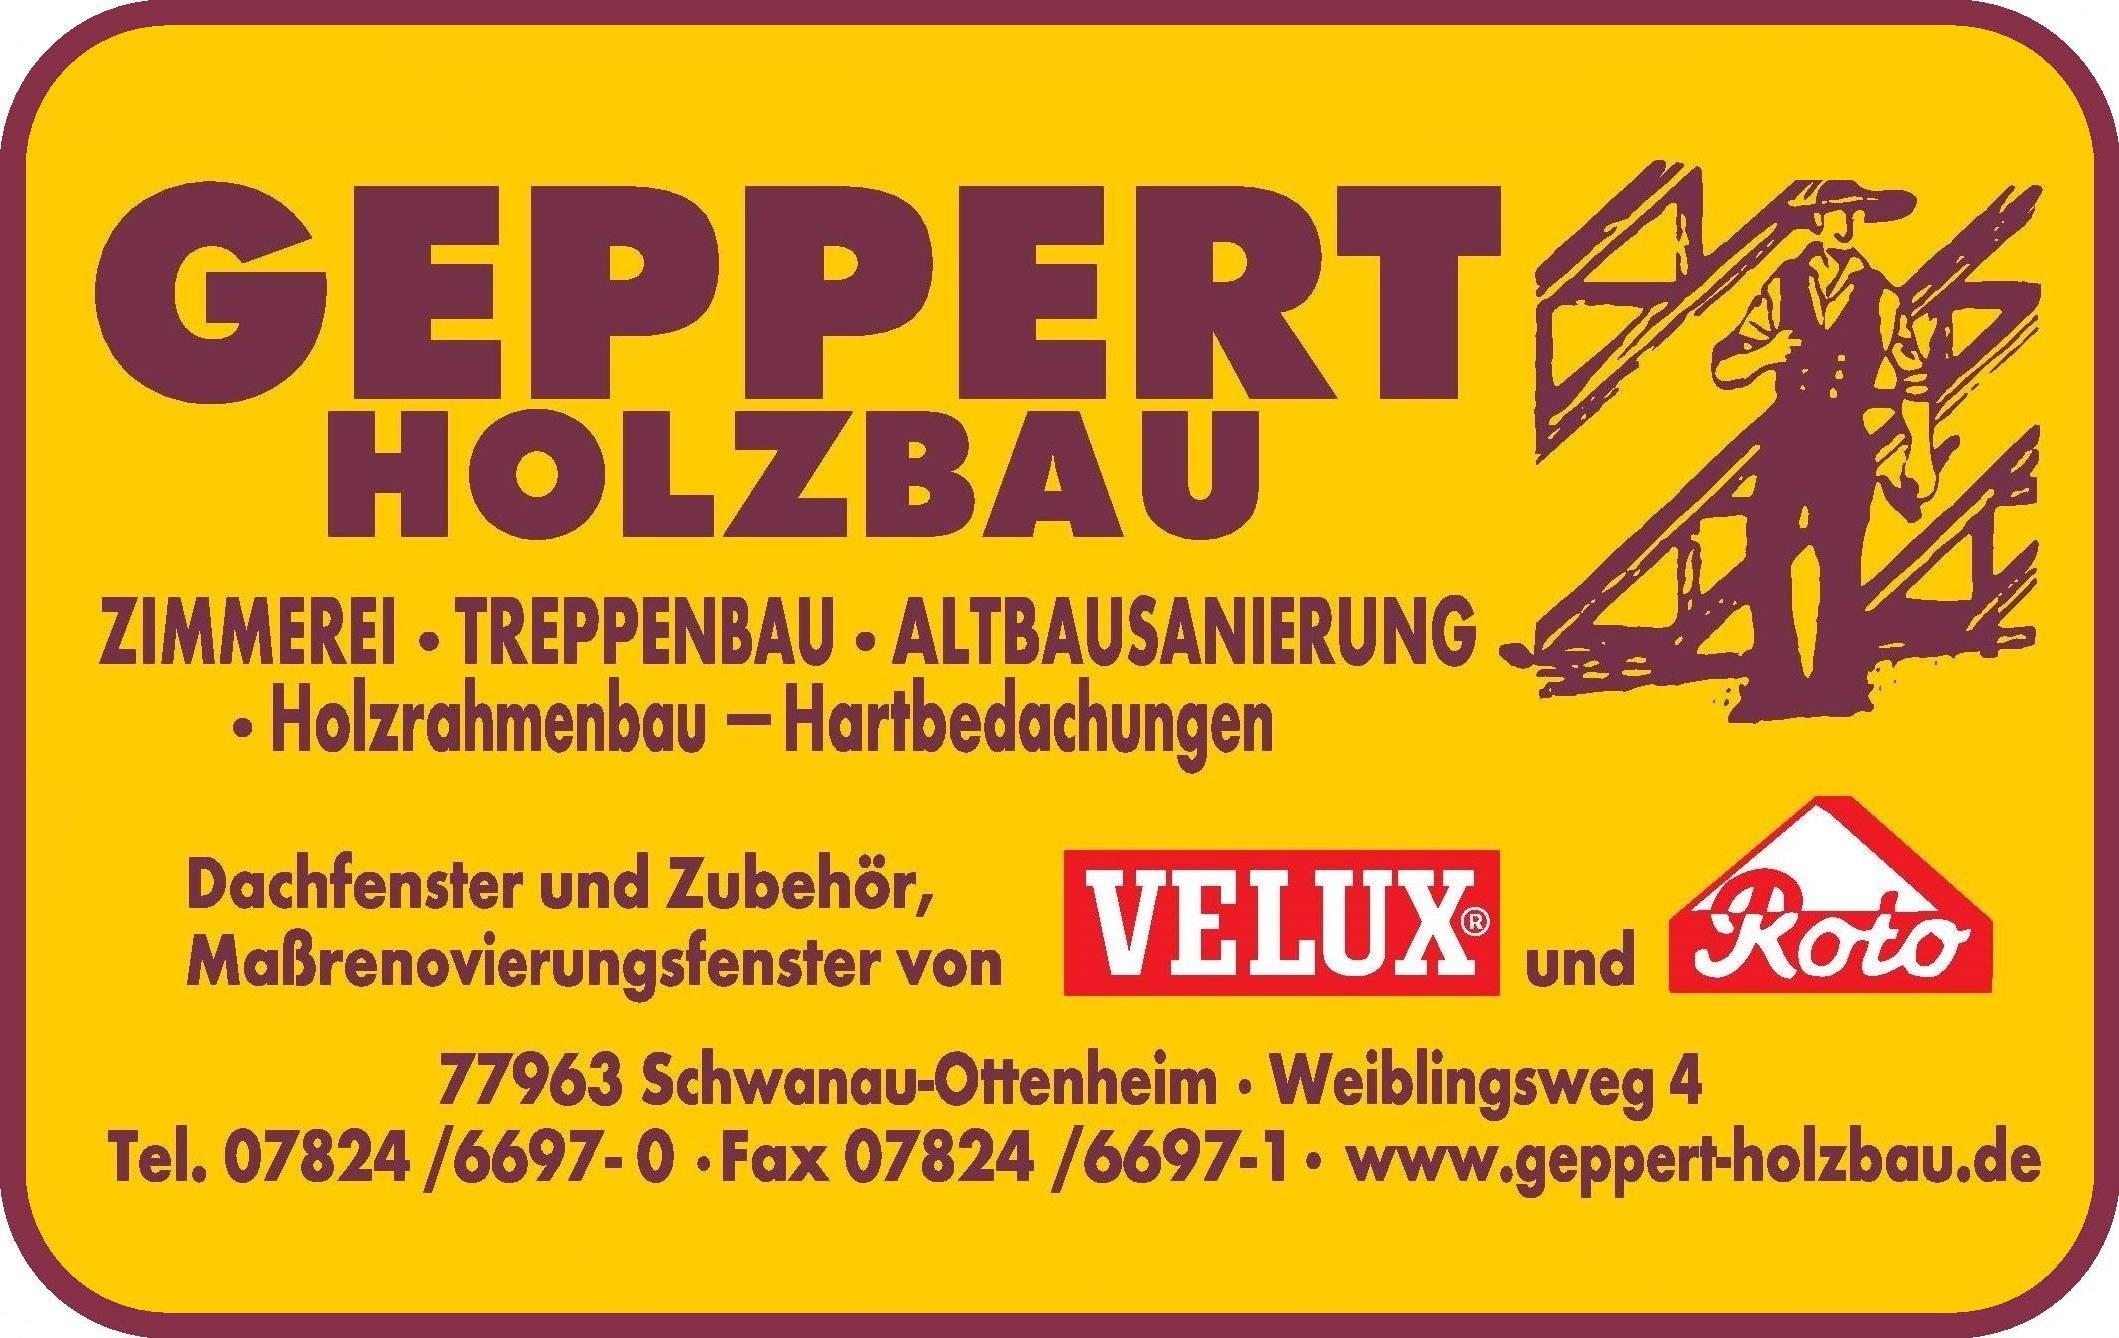 Geppert Holzbau